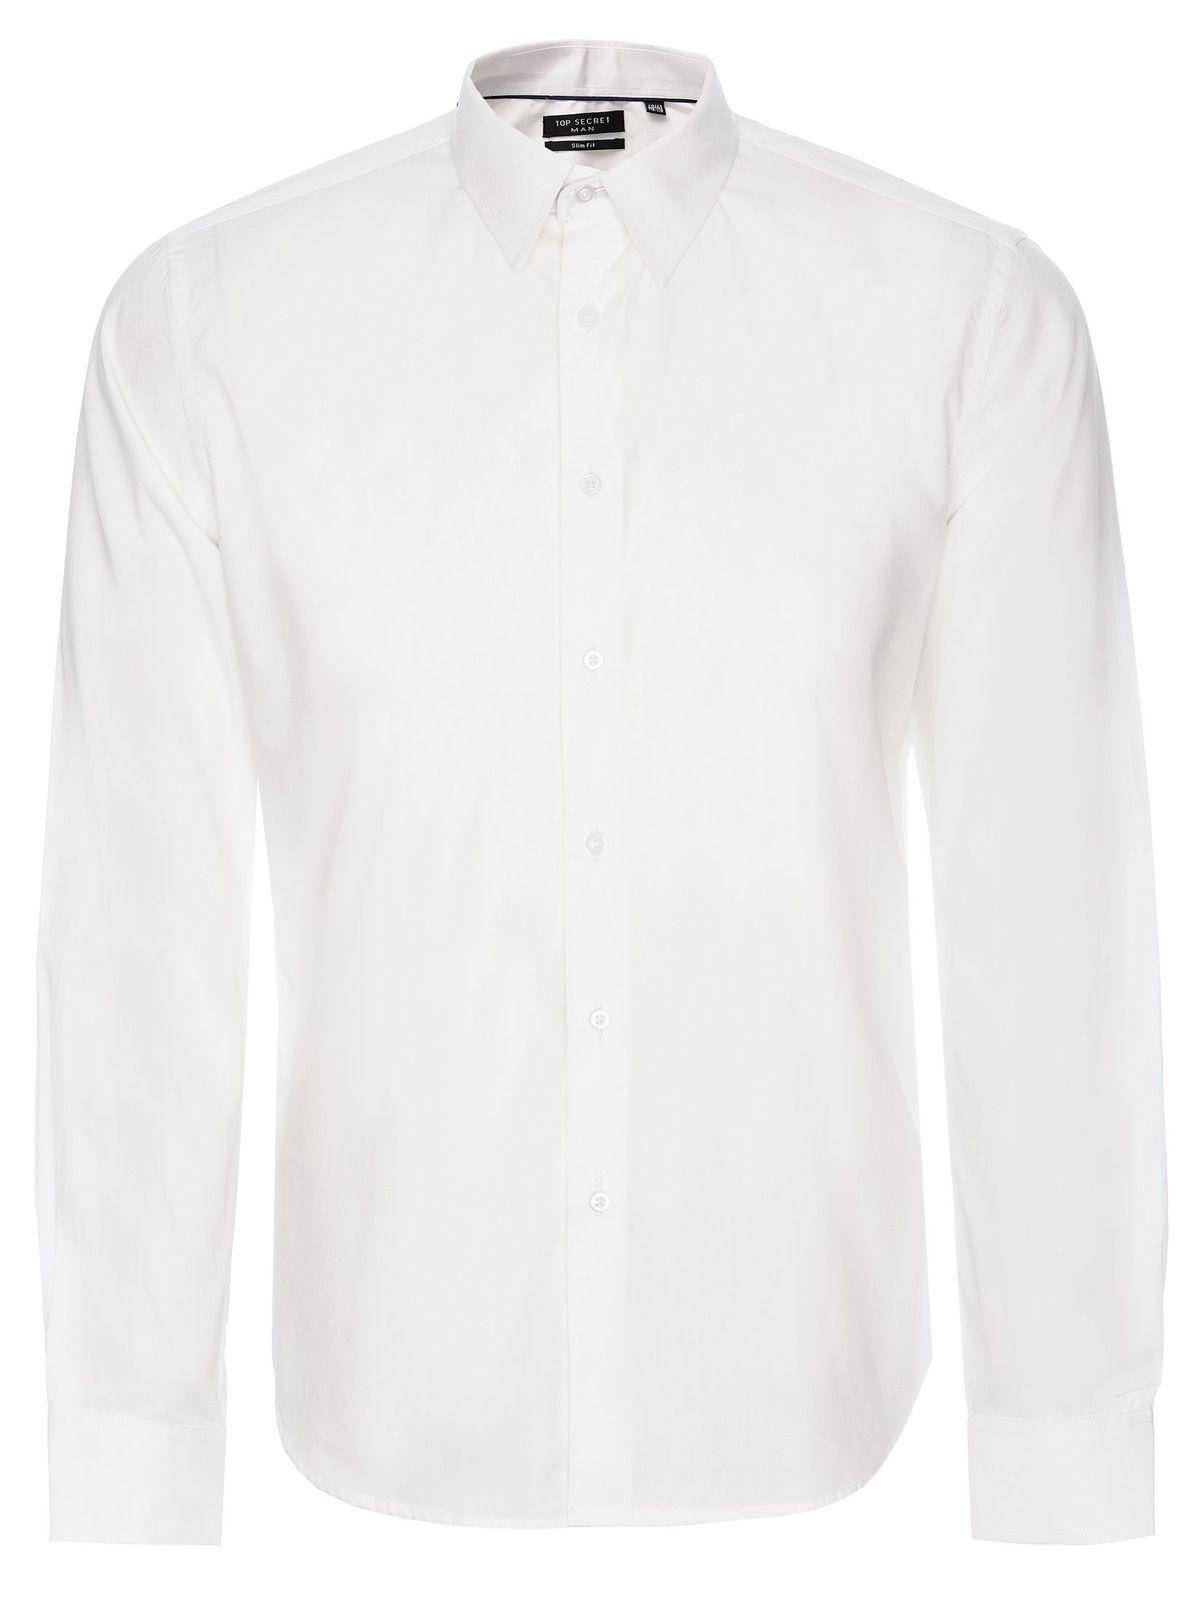 TOP SECRET slim fit πουκαμισο